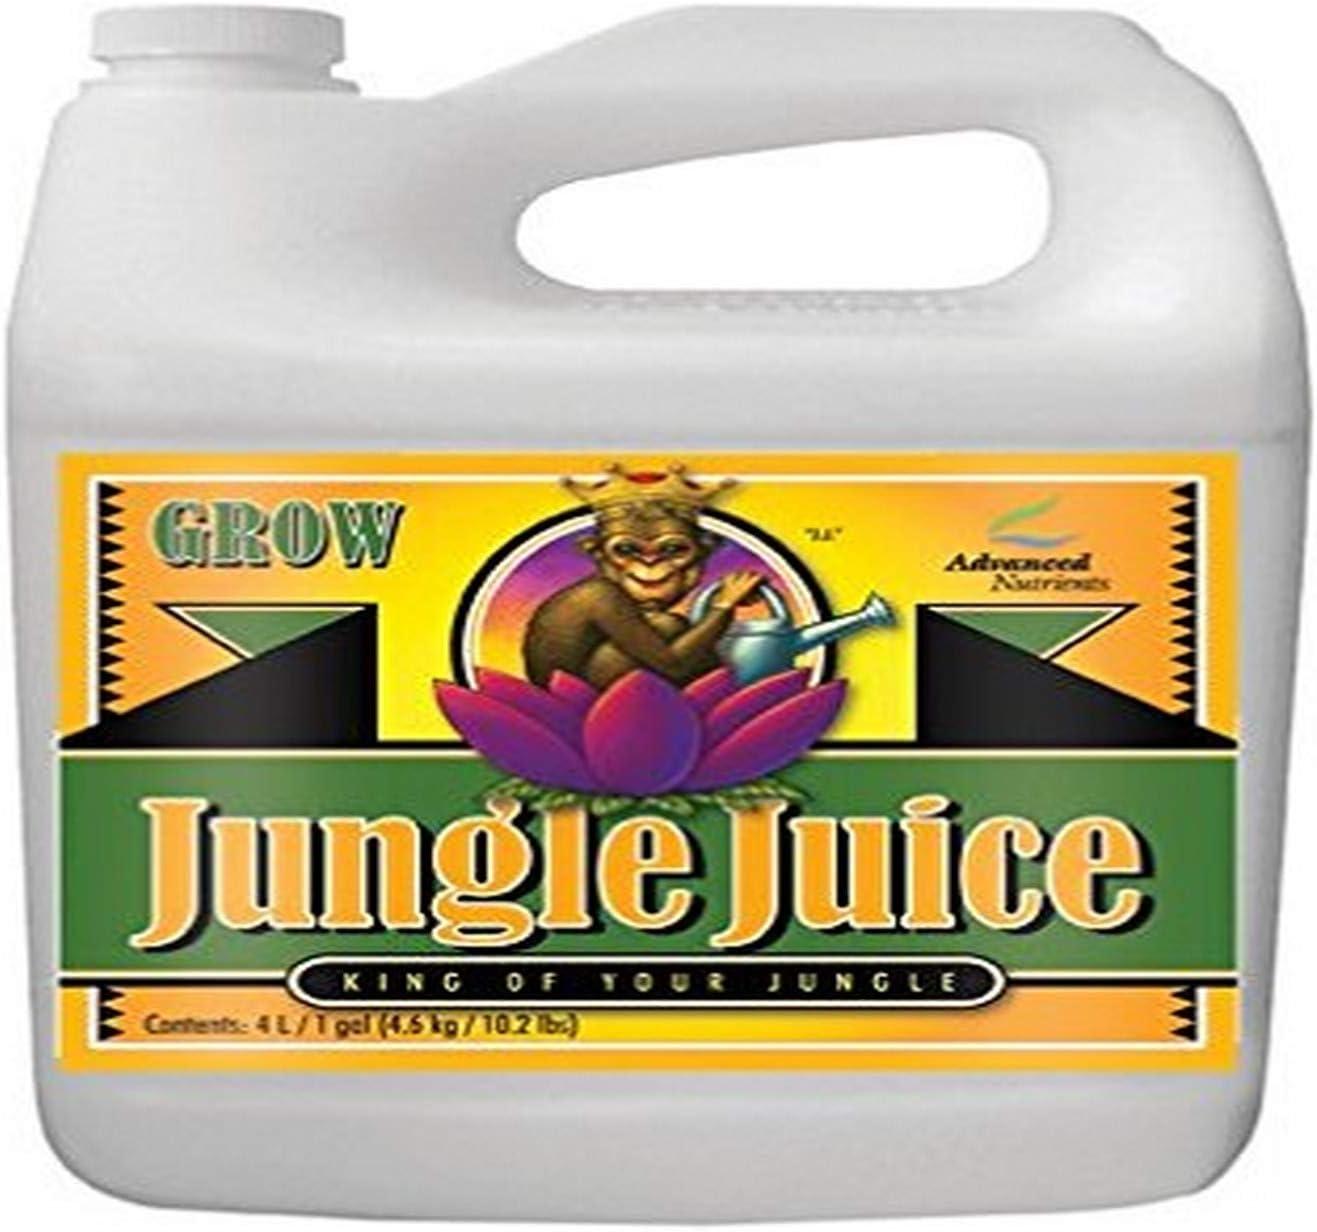 Advanced Nutrients 1725-15 Jungle Juice Grow Fertilizer, 4 Liter, Brown/A